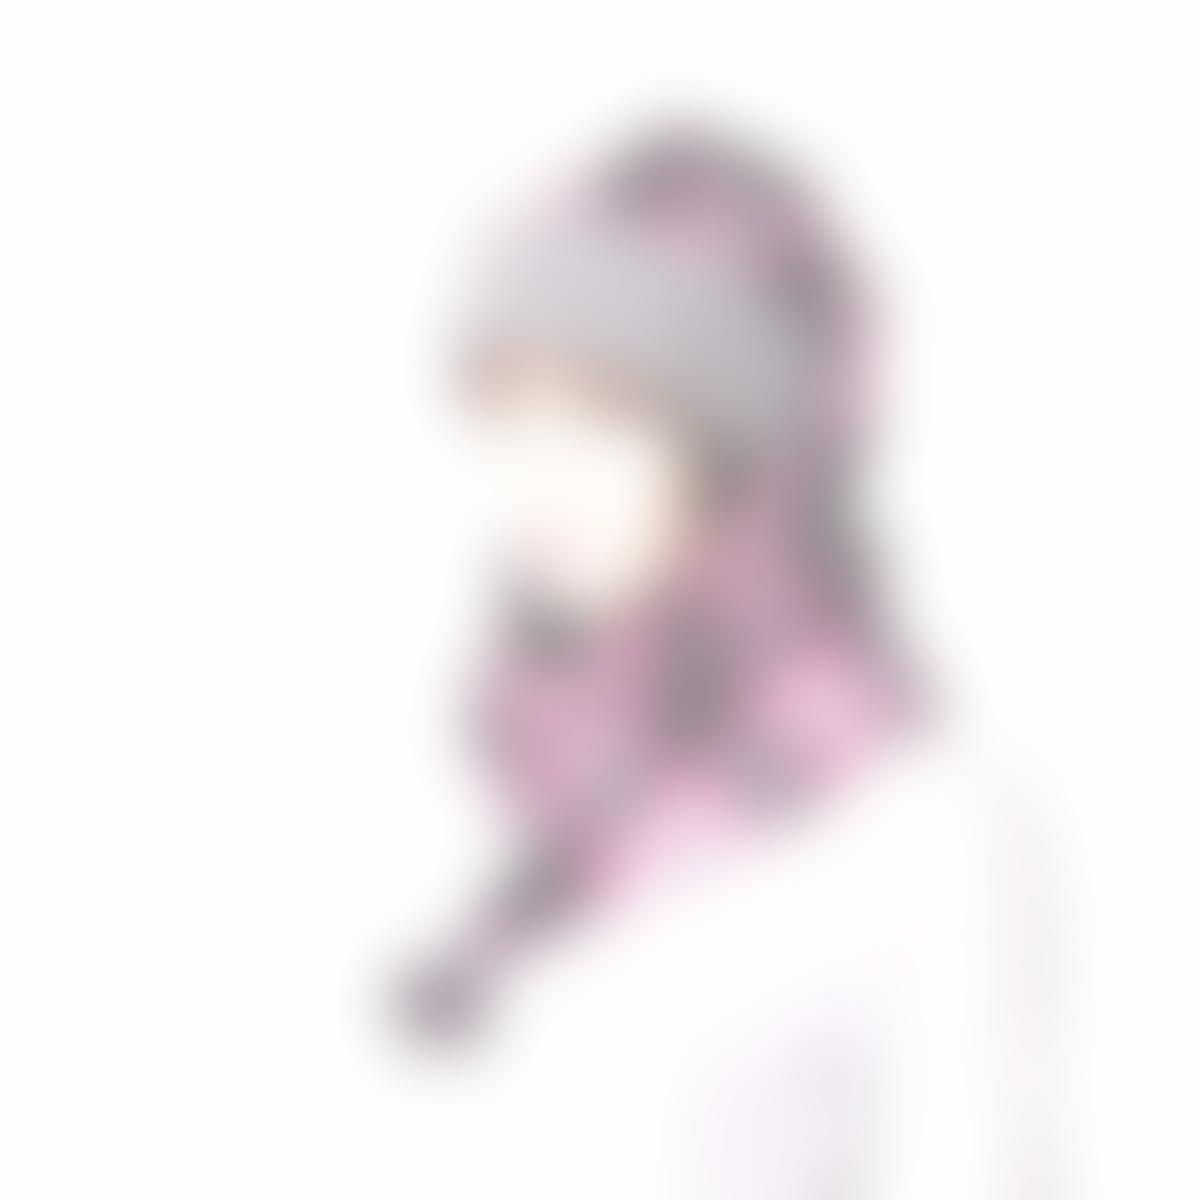 cd7f0979911 Amazon.com  Stocking Cap Long Pink Plaid Wrap Around with Pompom Fleece  Gray Sherpa Scarf Hat  Handmade